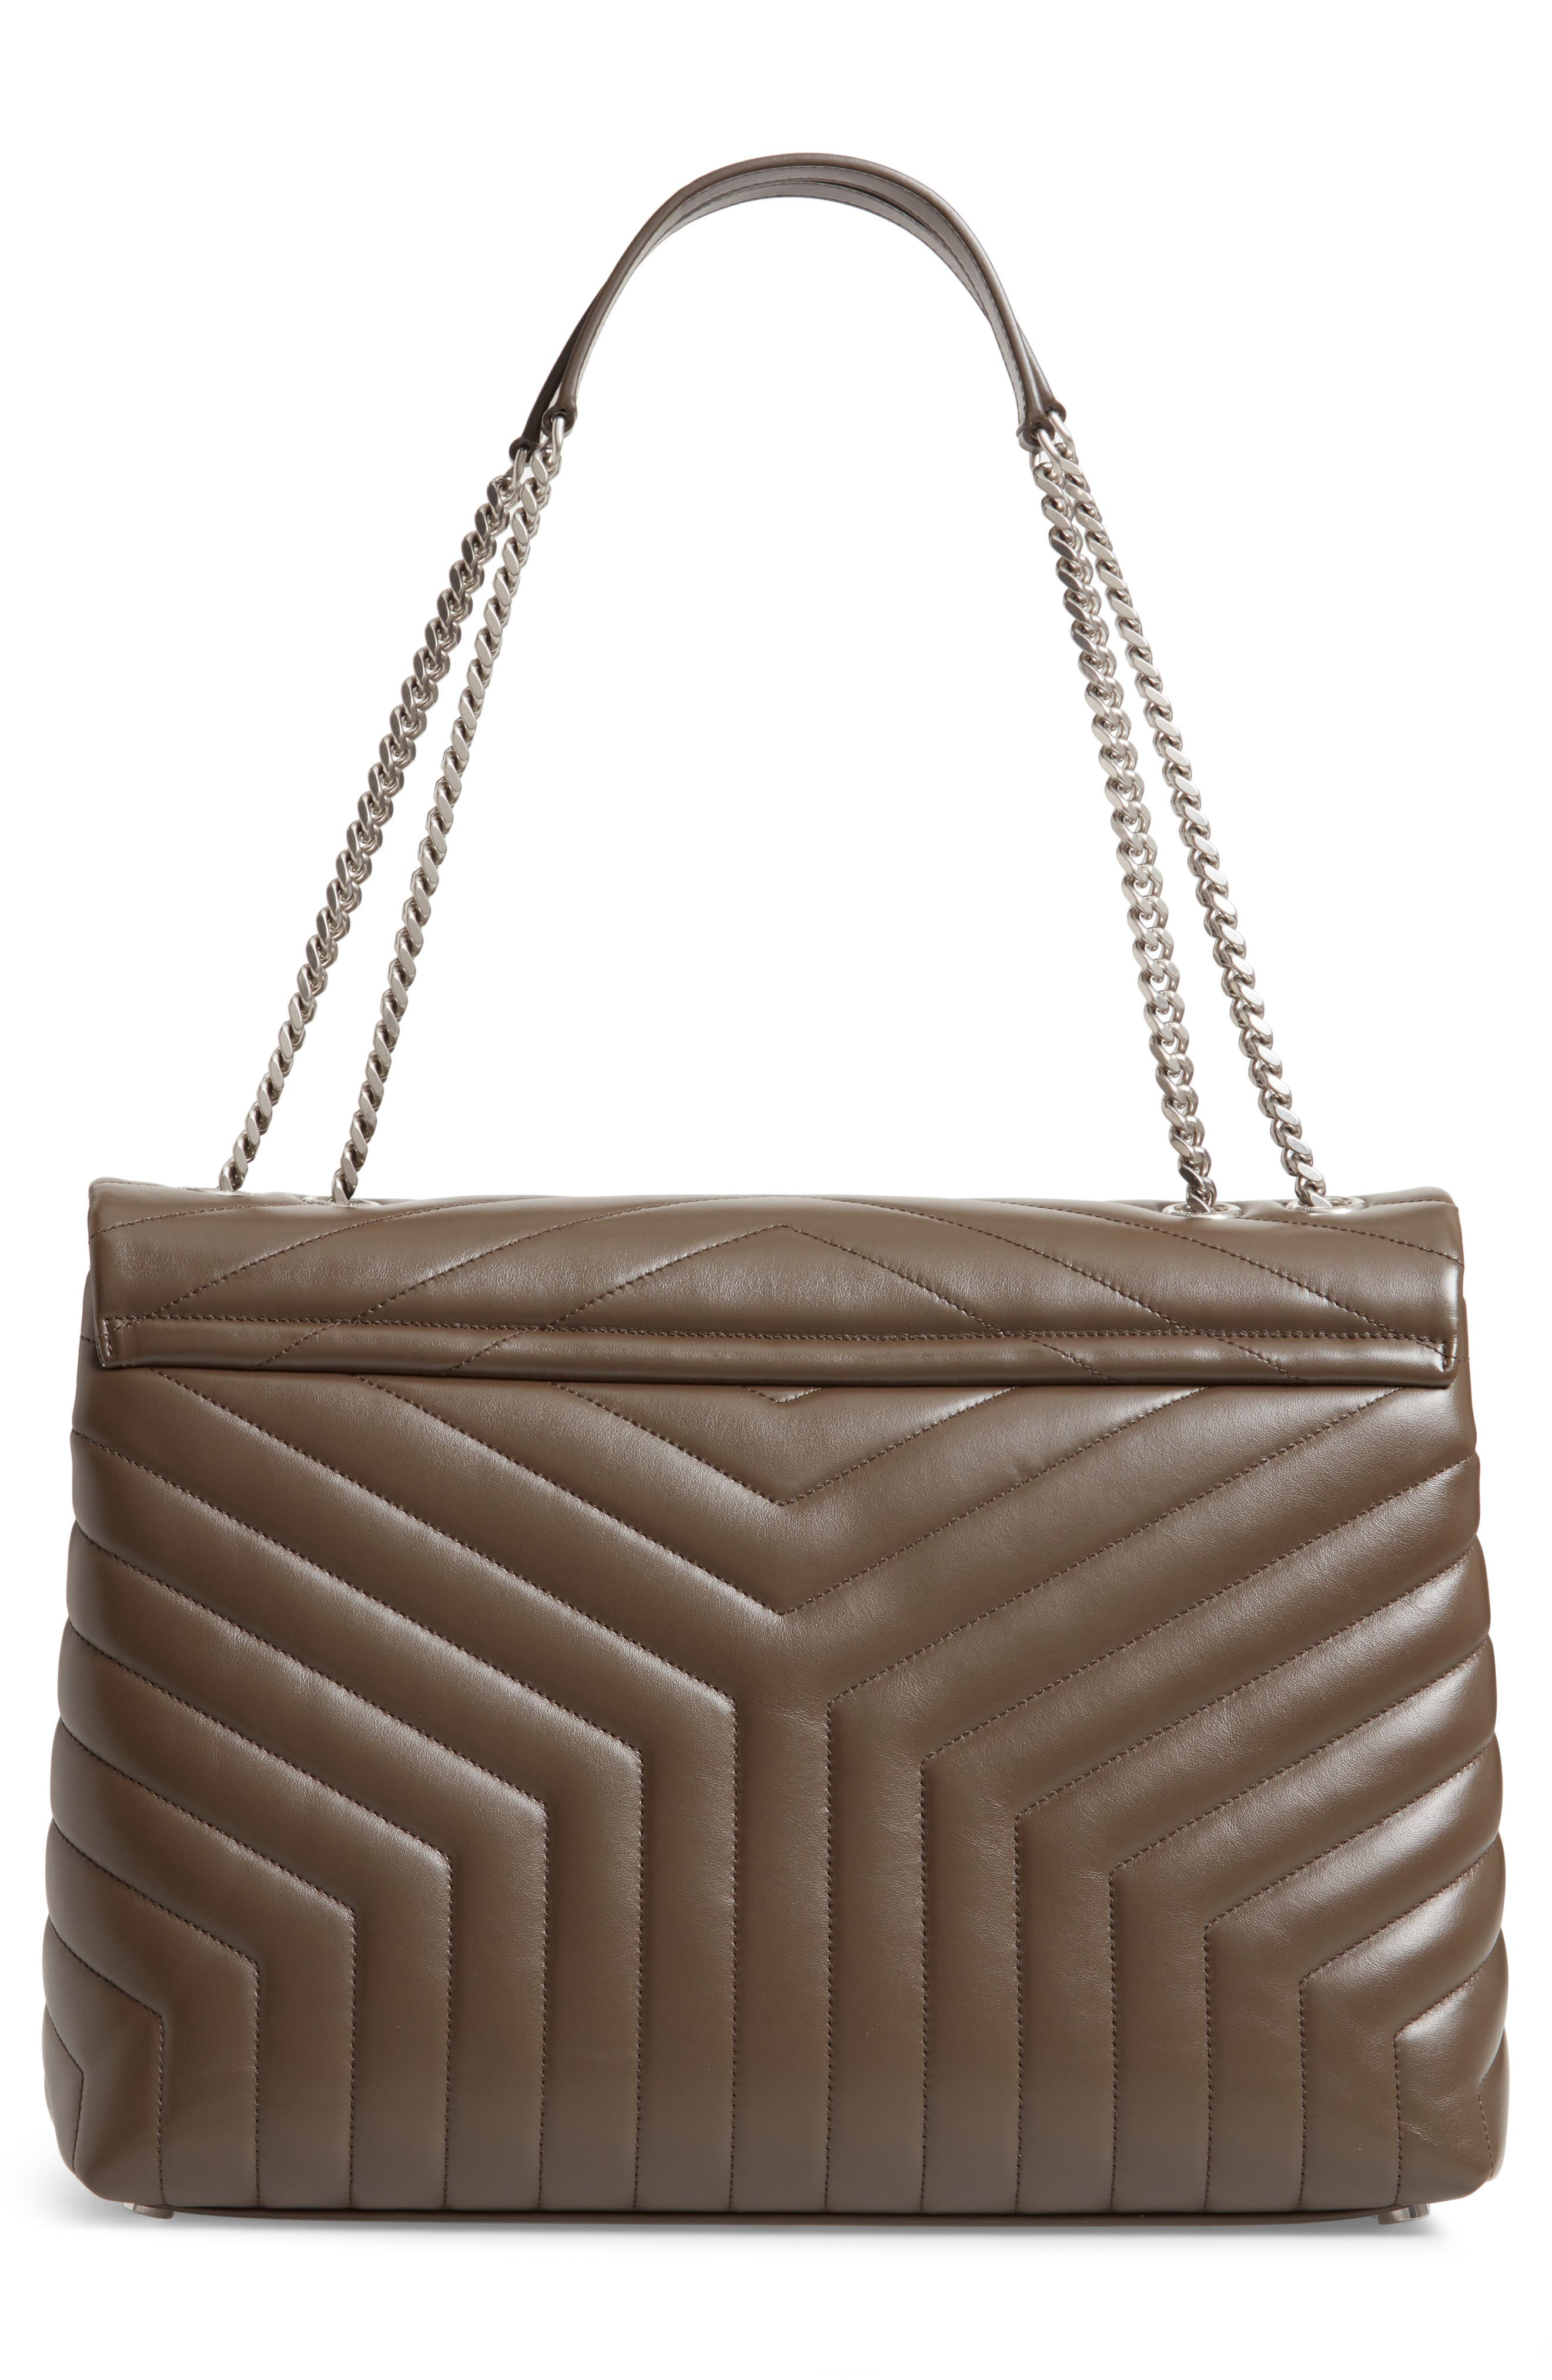 Large Loulou Matelassé Leather Shoulder Bag,                             Alternate thumbnail 3, color,                             FAGGIO/ FAGGIO